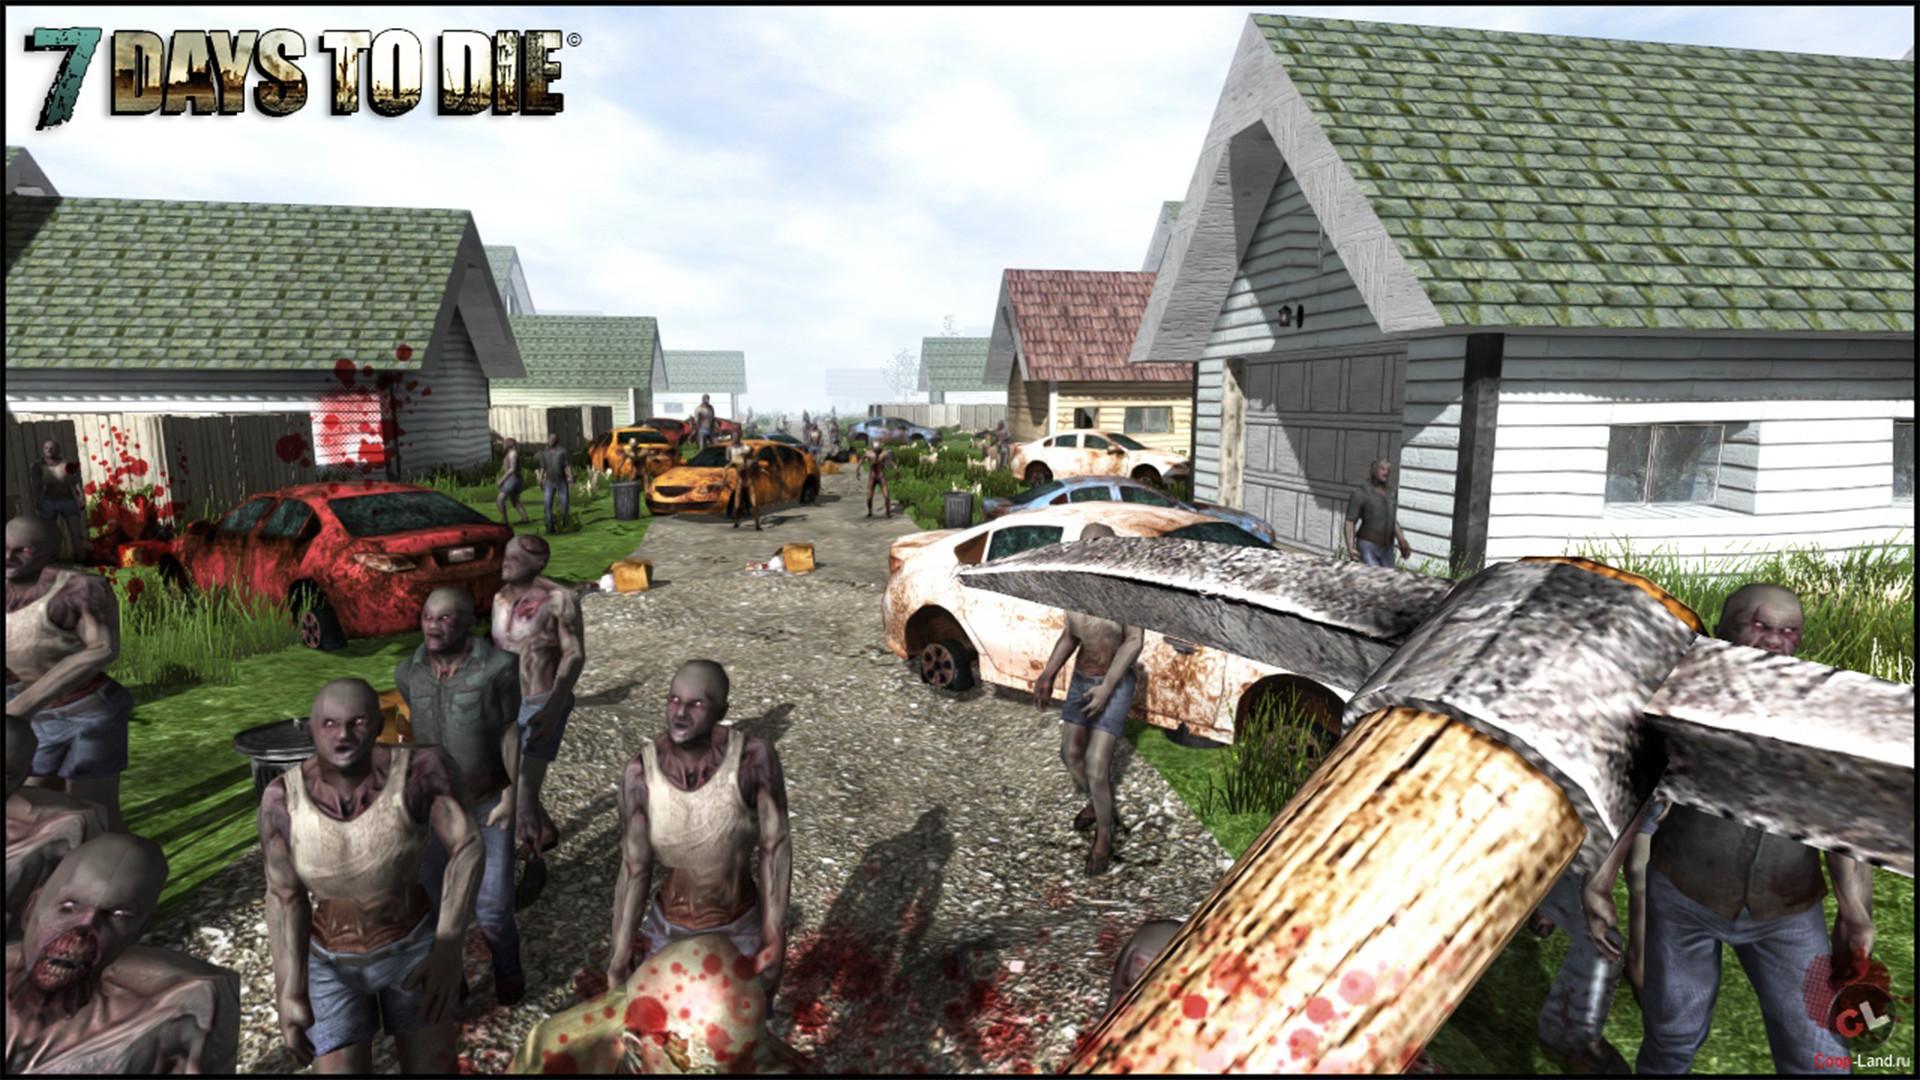 Video Game – 7 Days to die Wallpaper